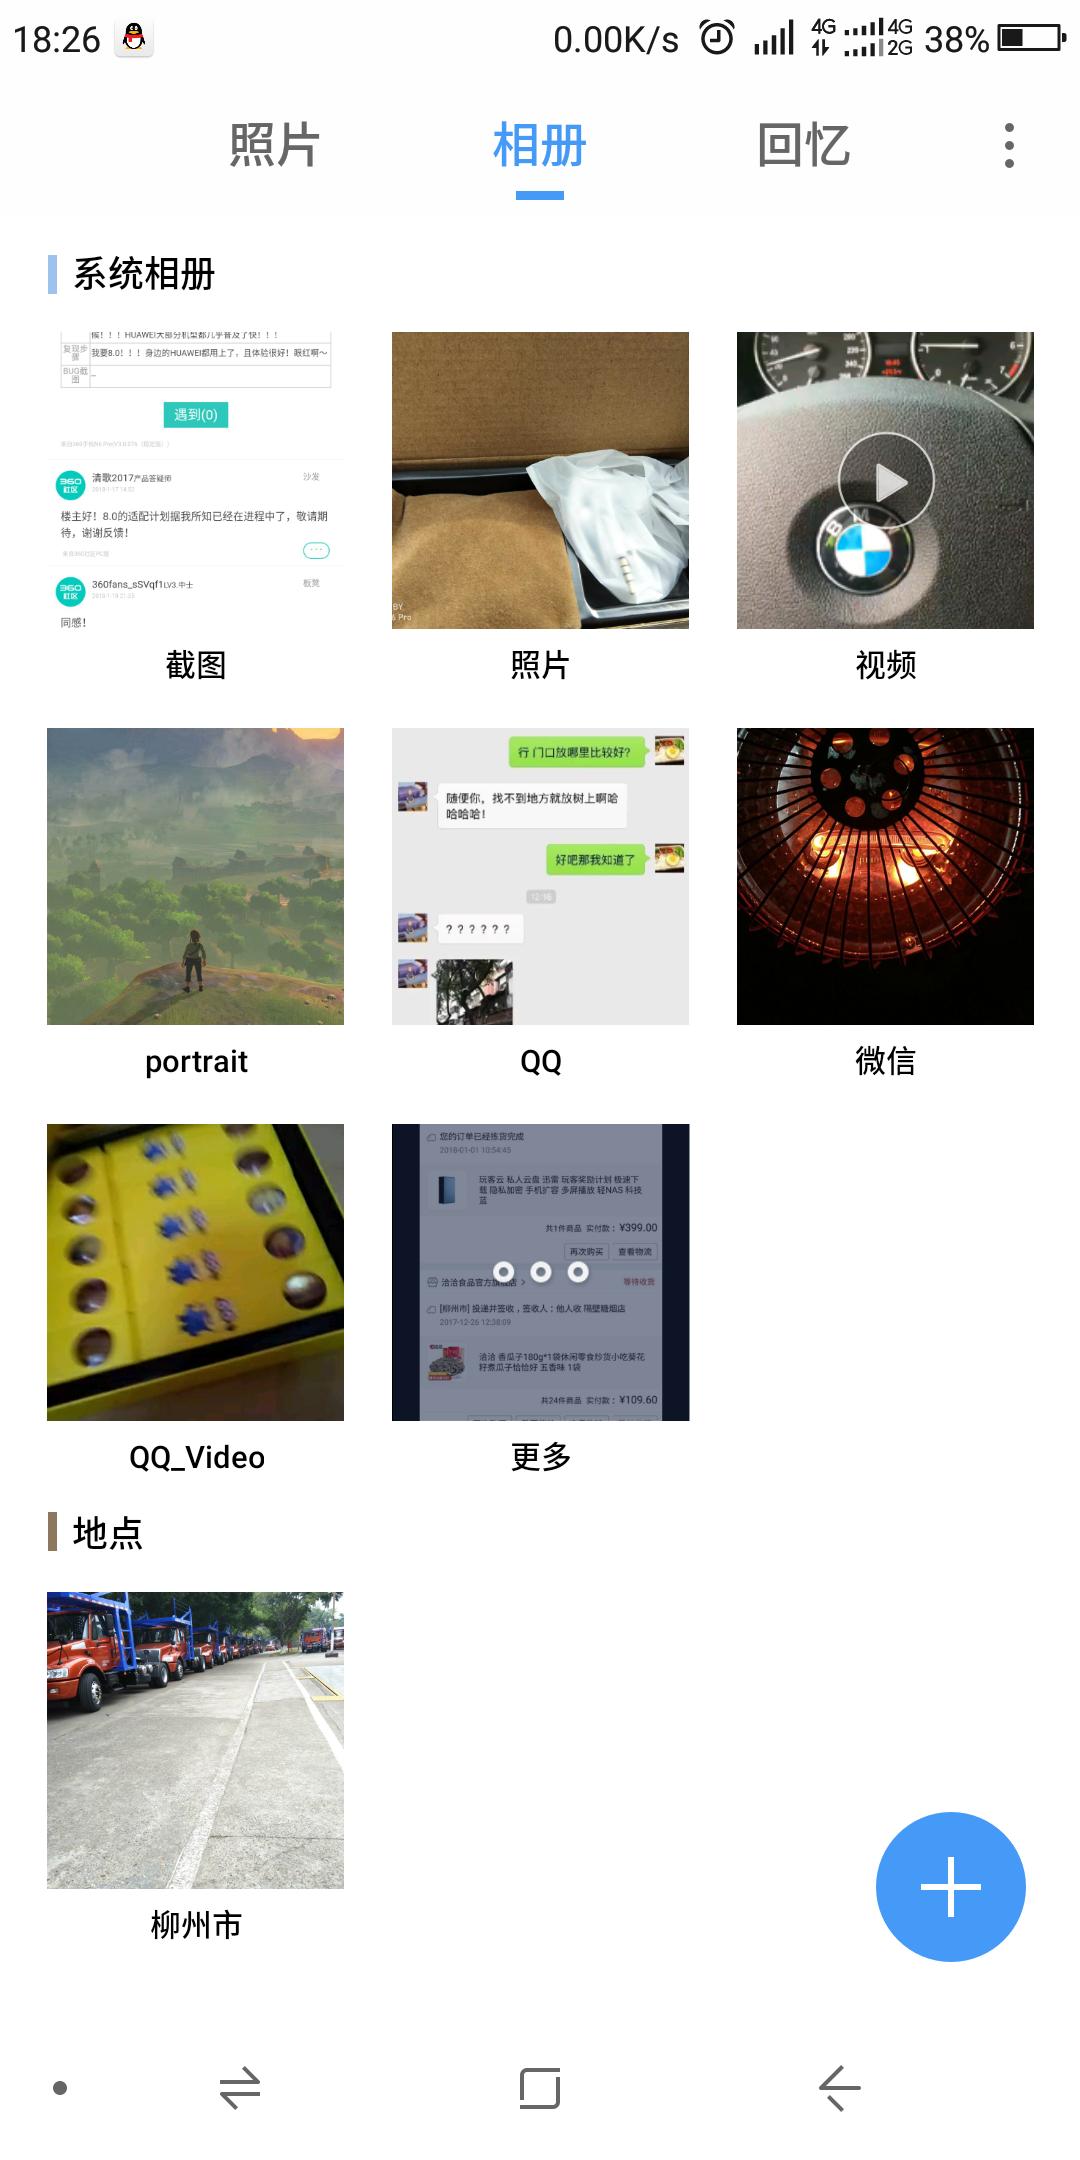 Screenshot_2018-01-19-18-26-47.png